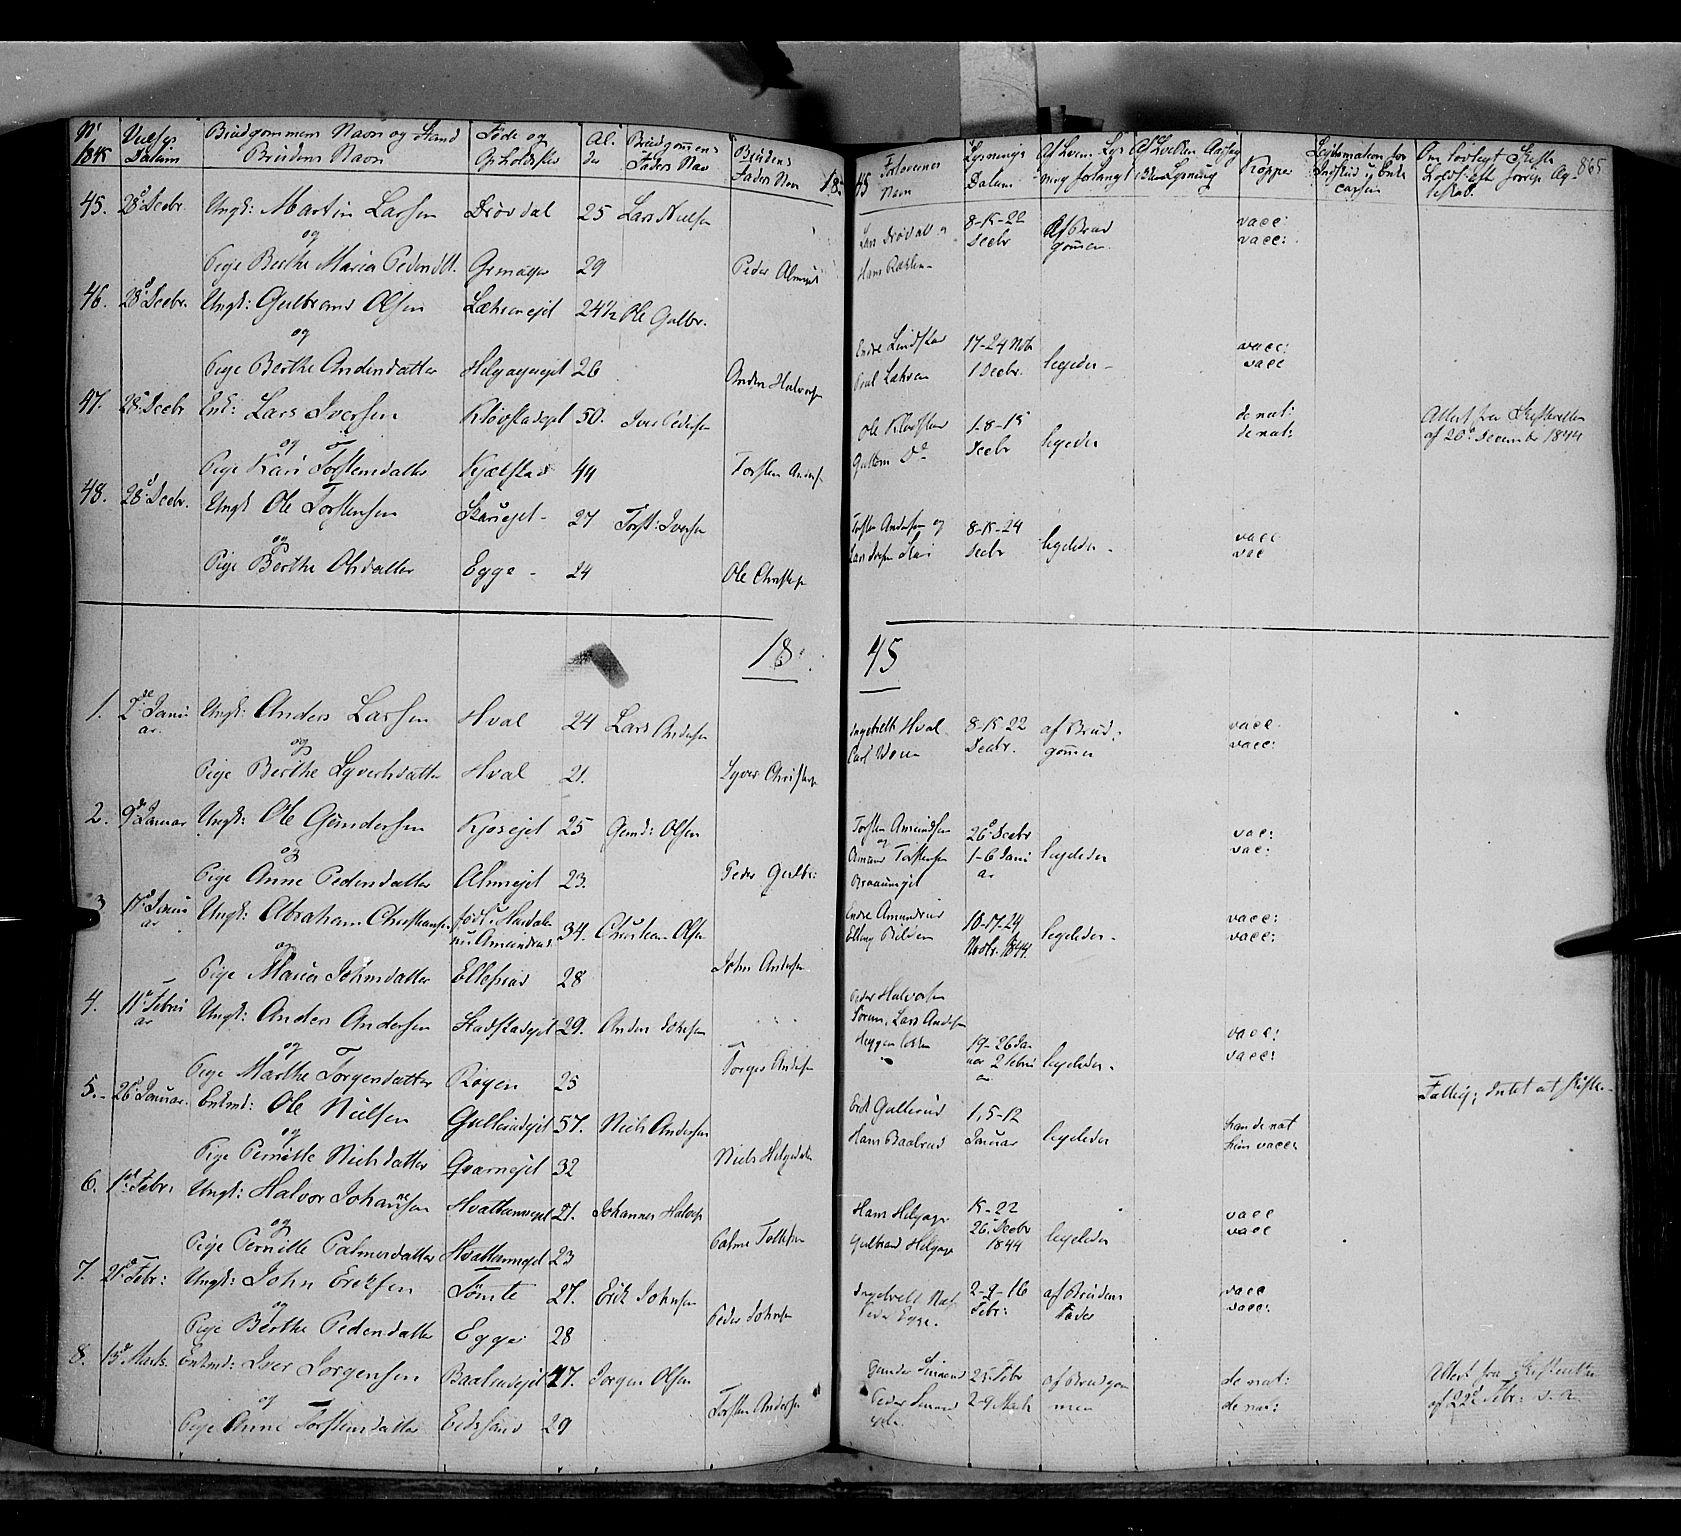 SAH, Gran prestekontor, Ministerialbok nr. 11, 1842-1856, s. 864-865